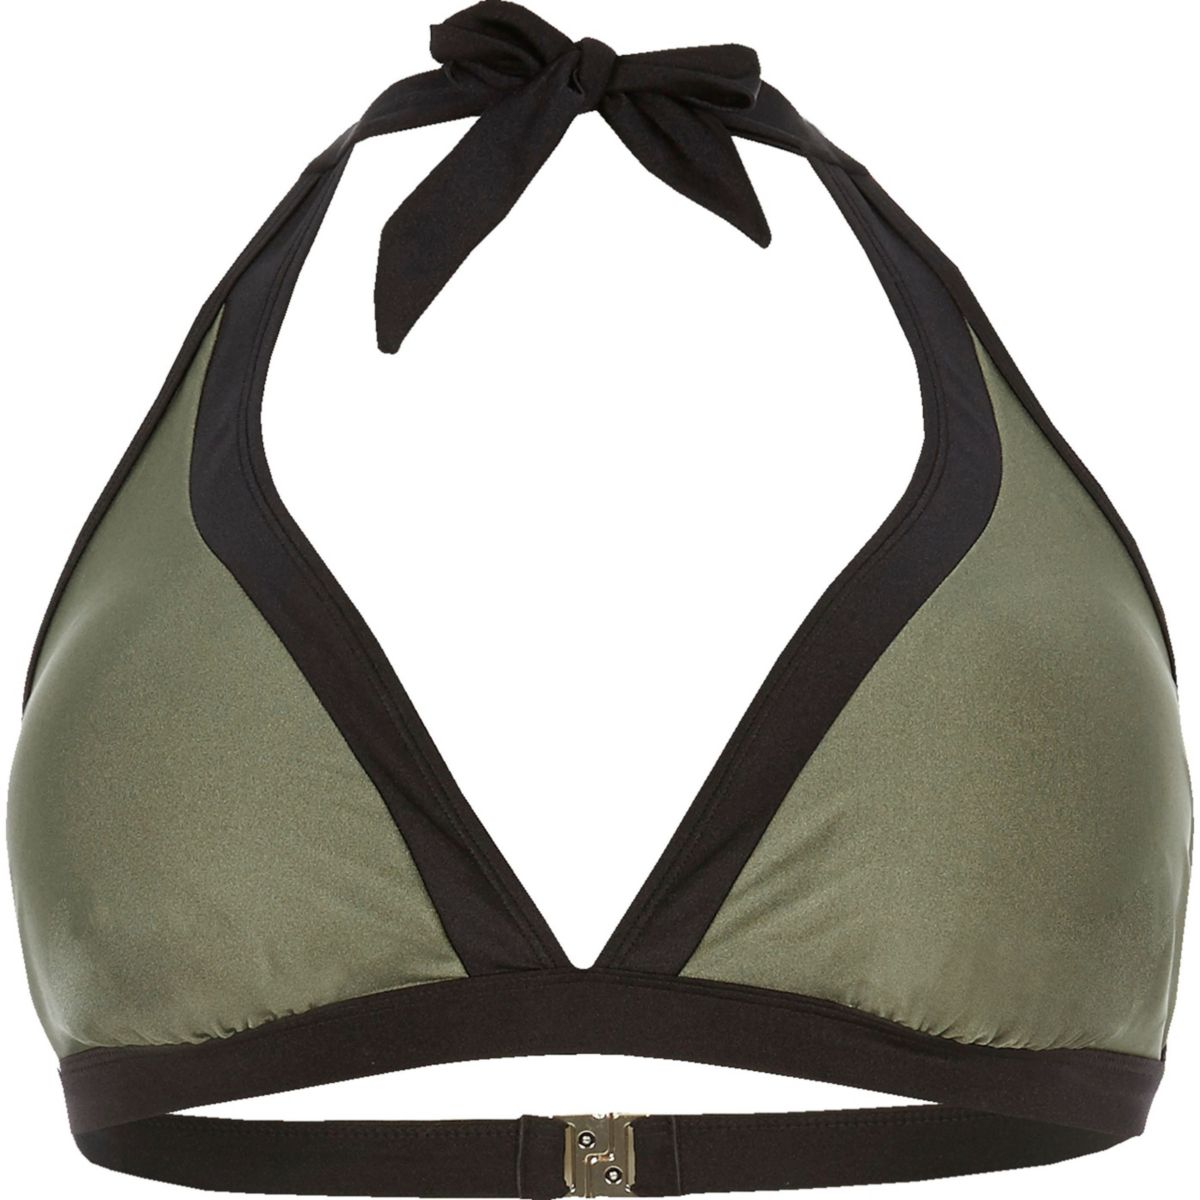 Haut de bikini Plus kaki colour block avec liens